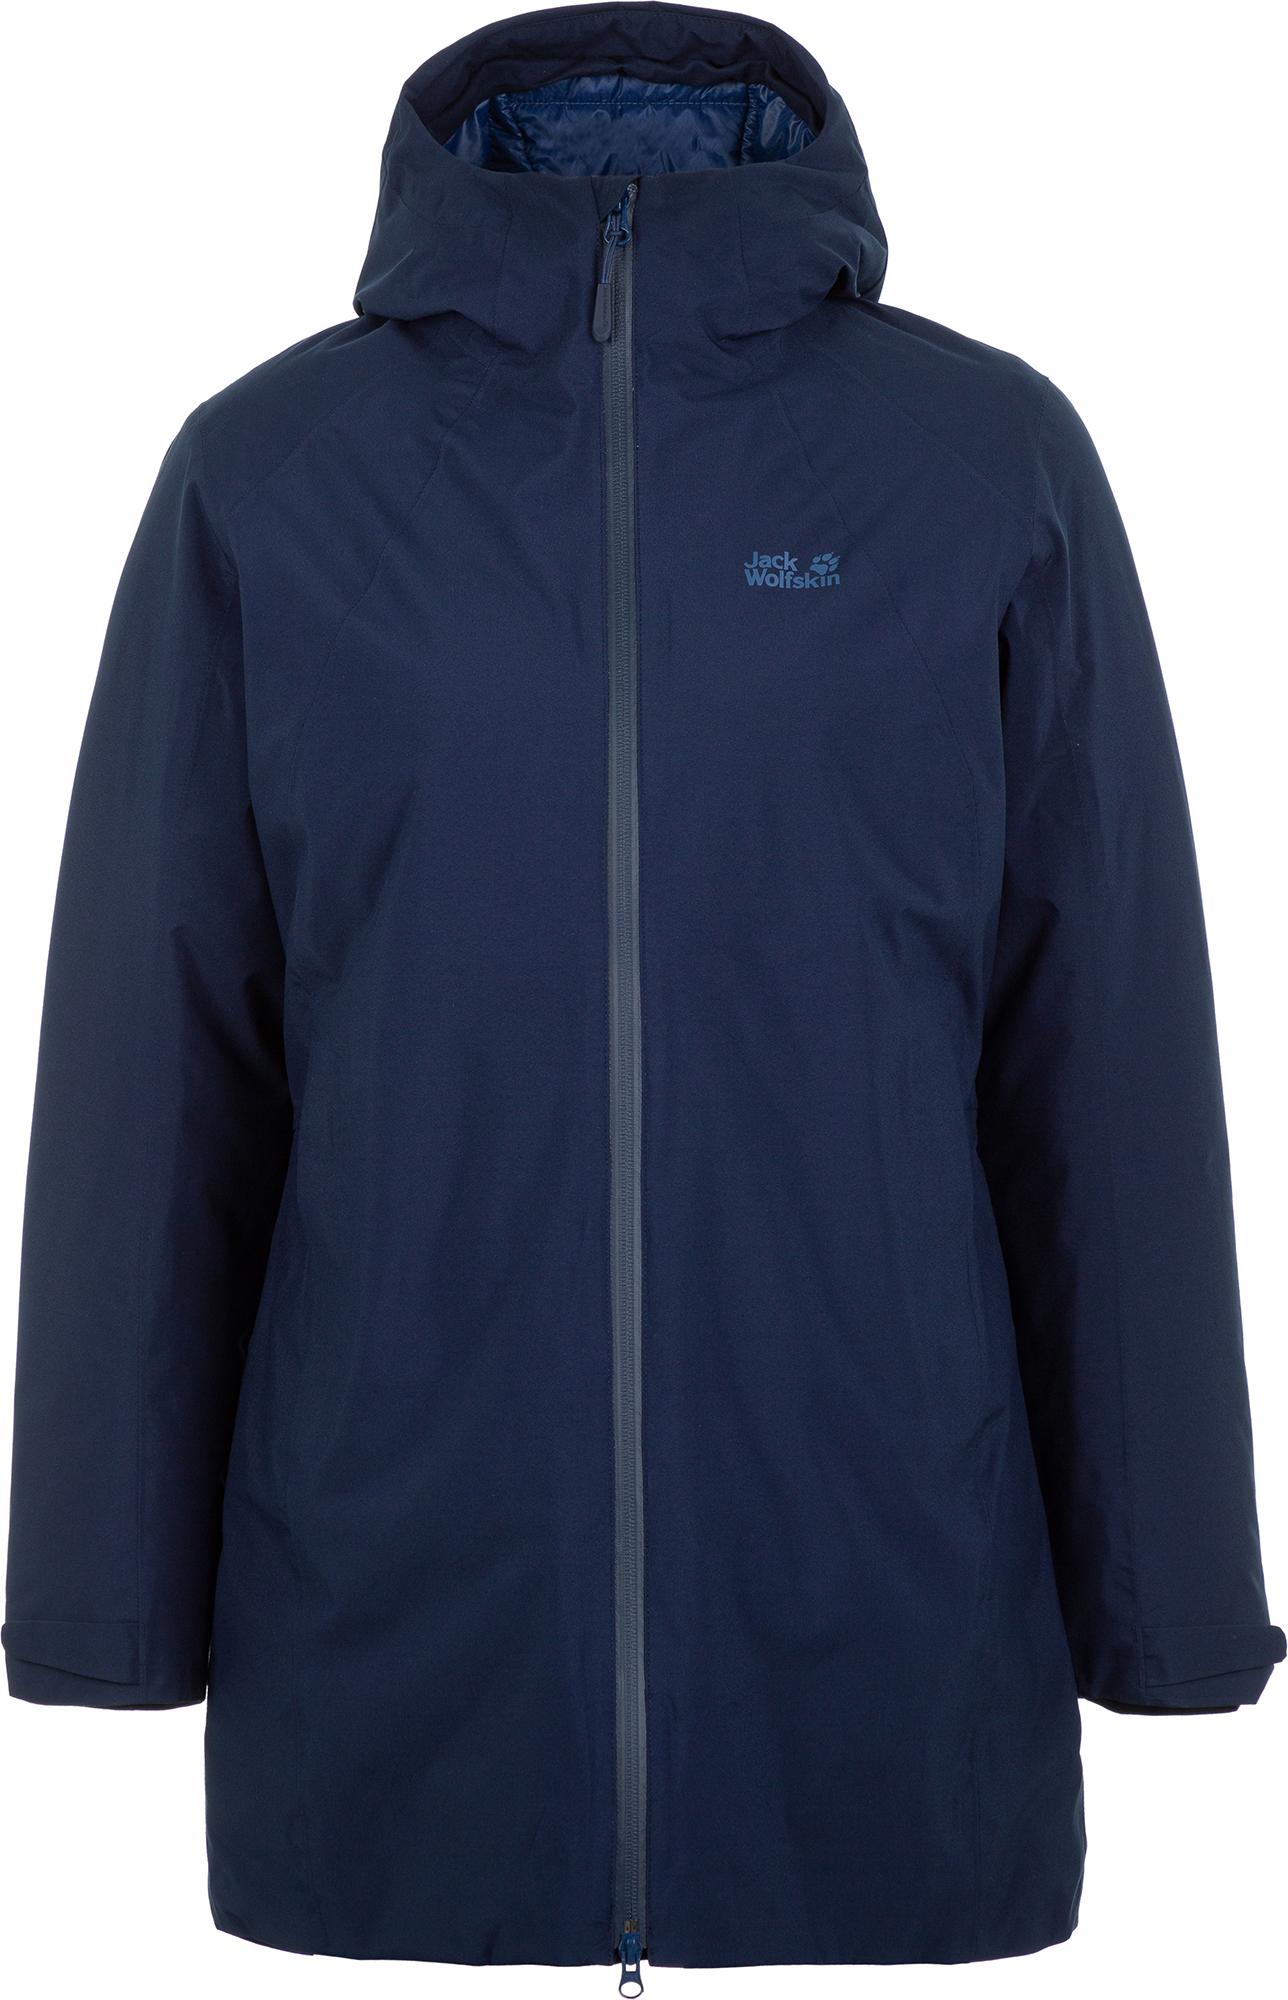 Jack Wolfskin Куртка утепленная женская Astana, размер 50